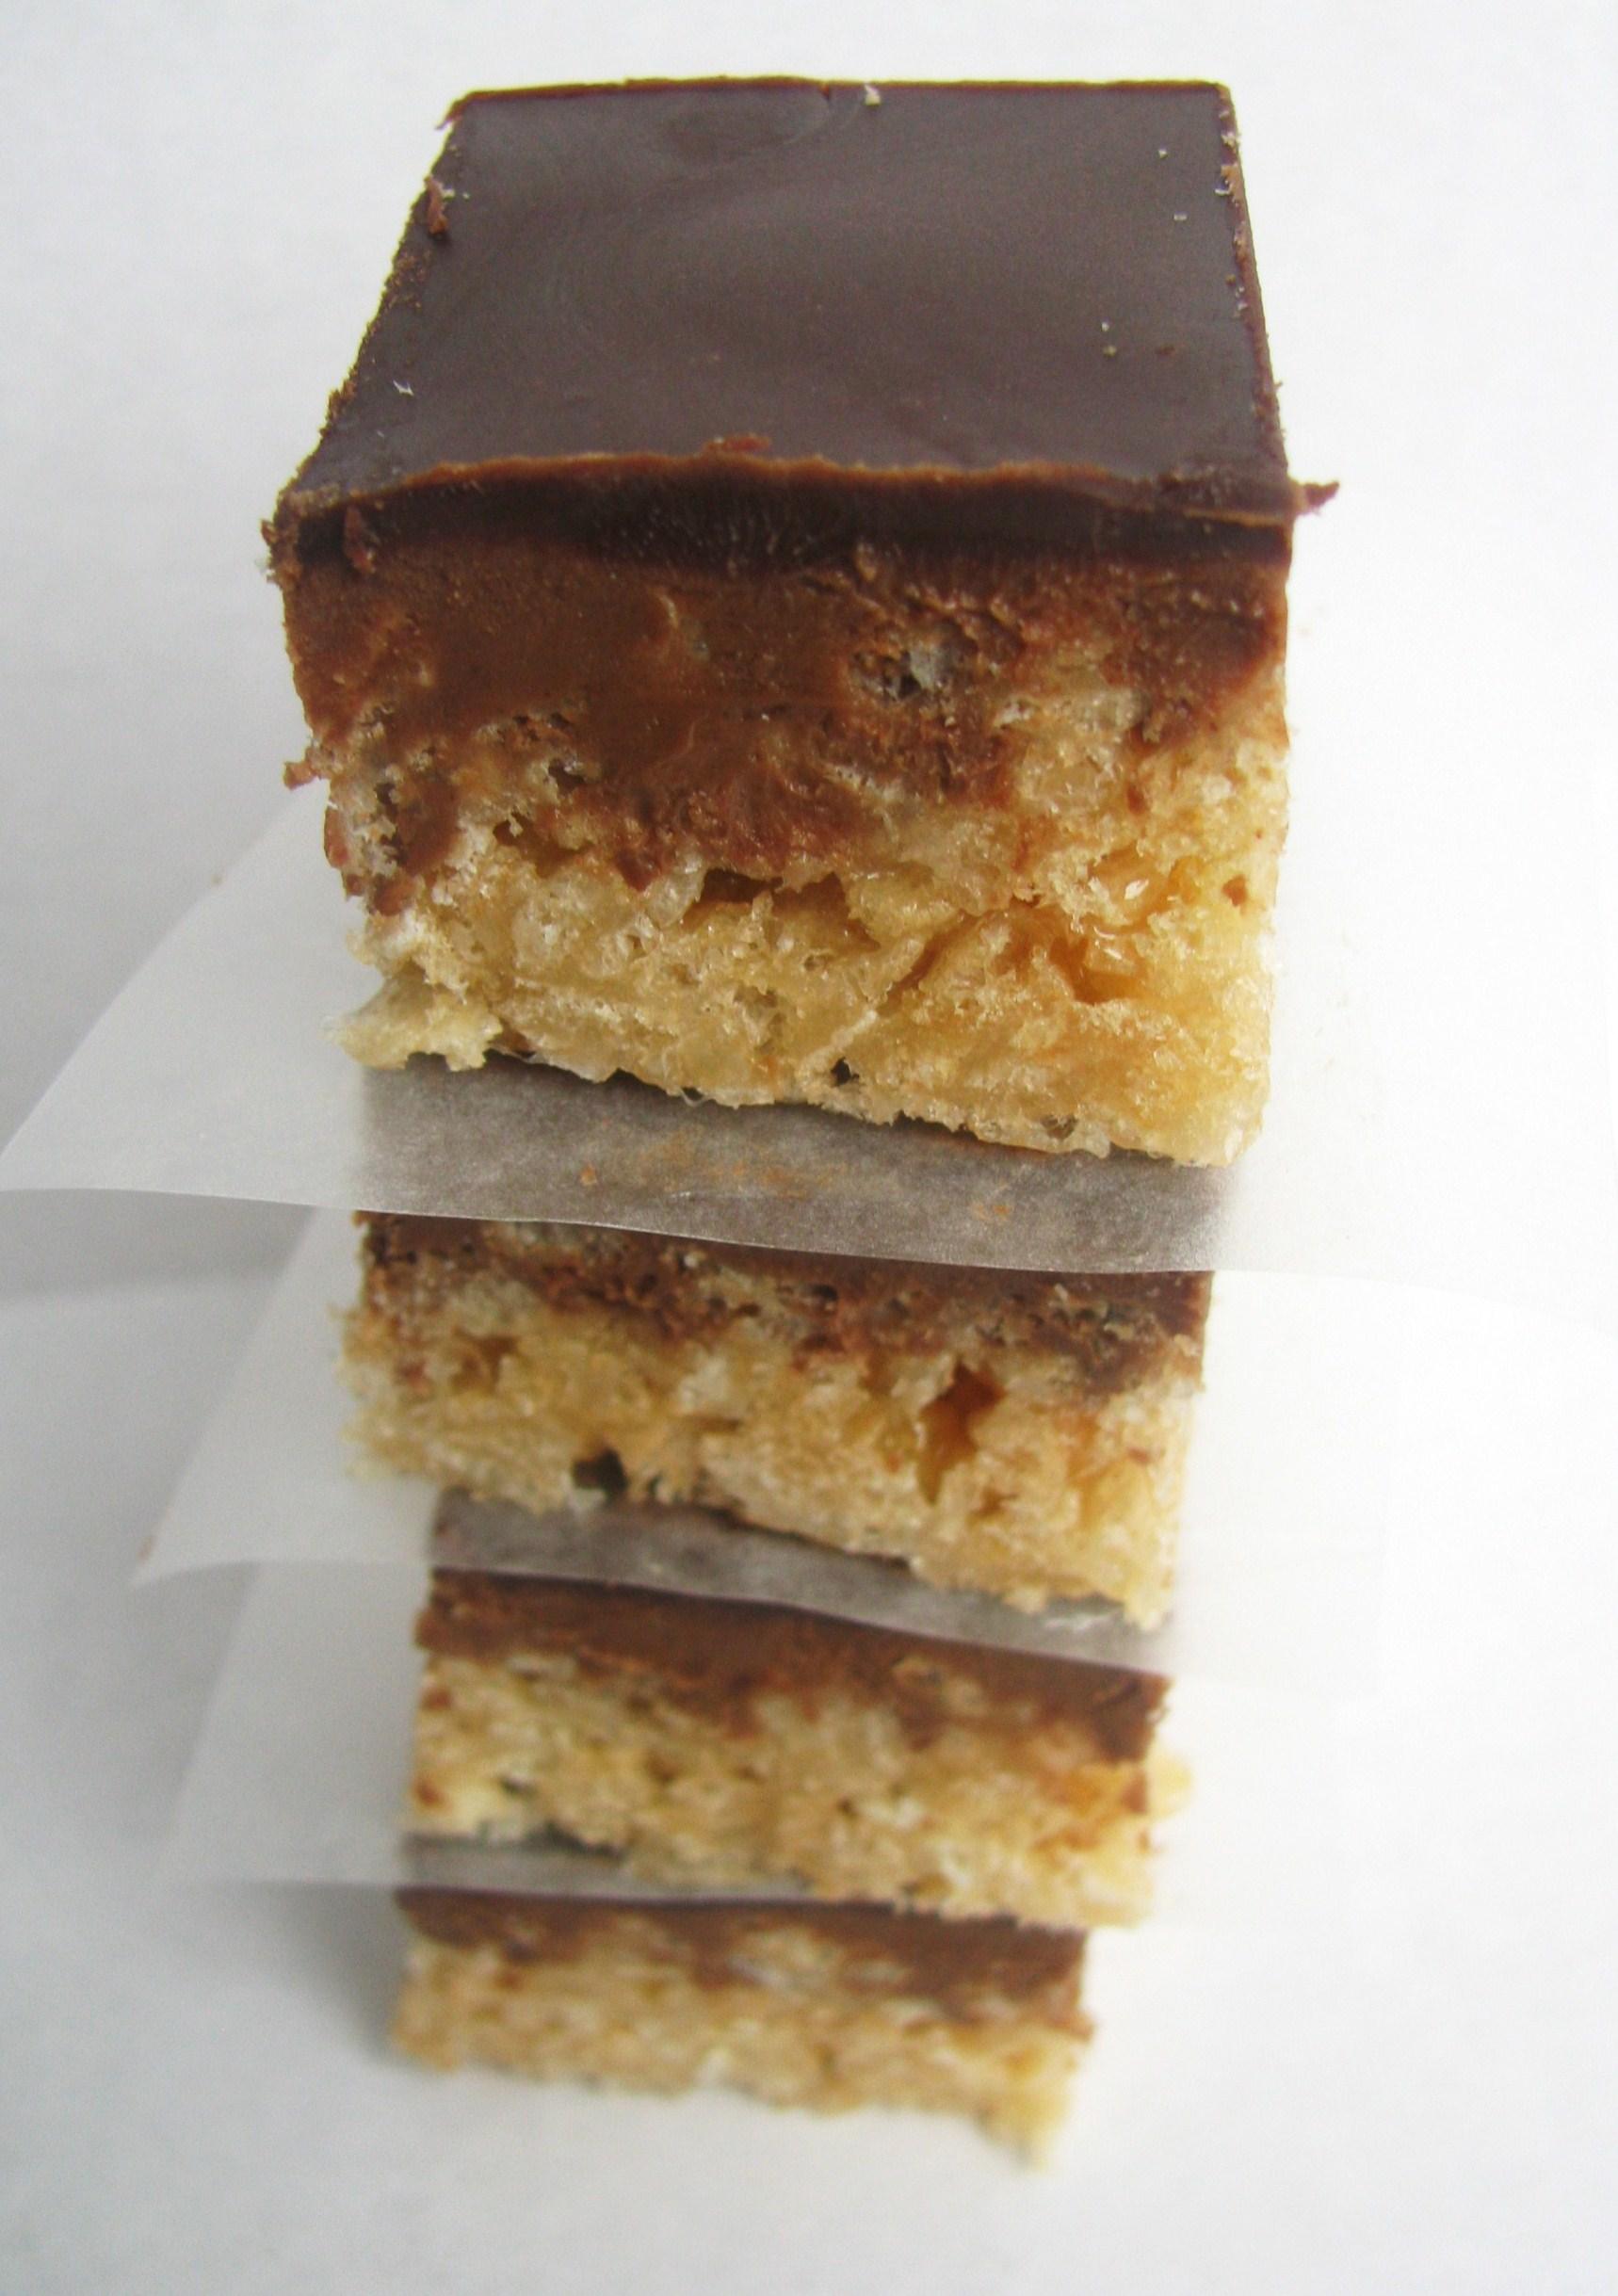 Peanut Butter Chocolate Crispy Bars | Stick a Fork in It